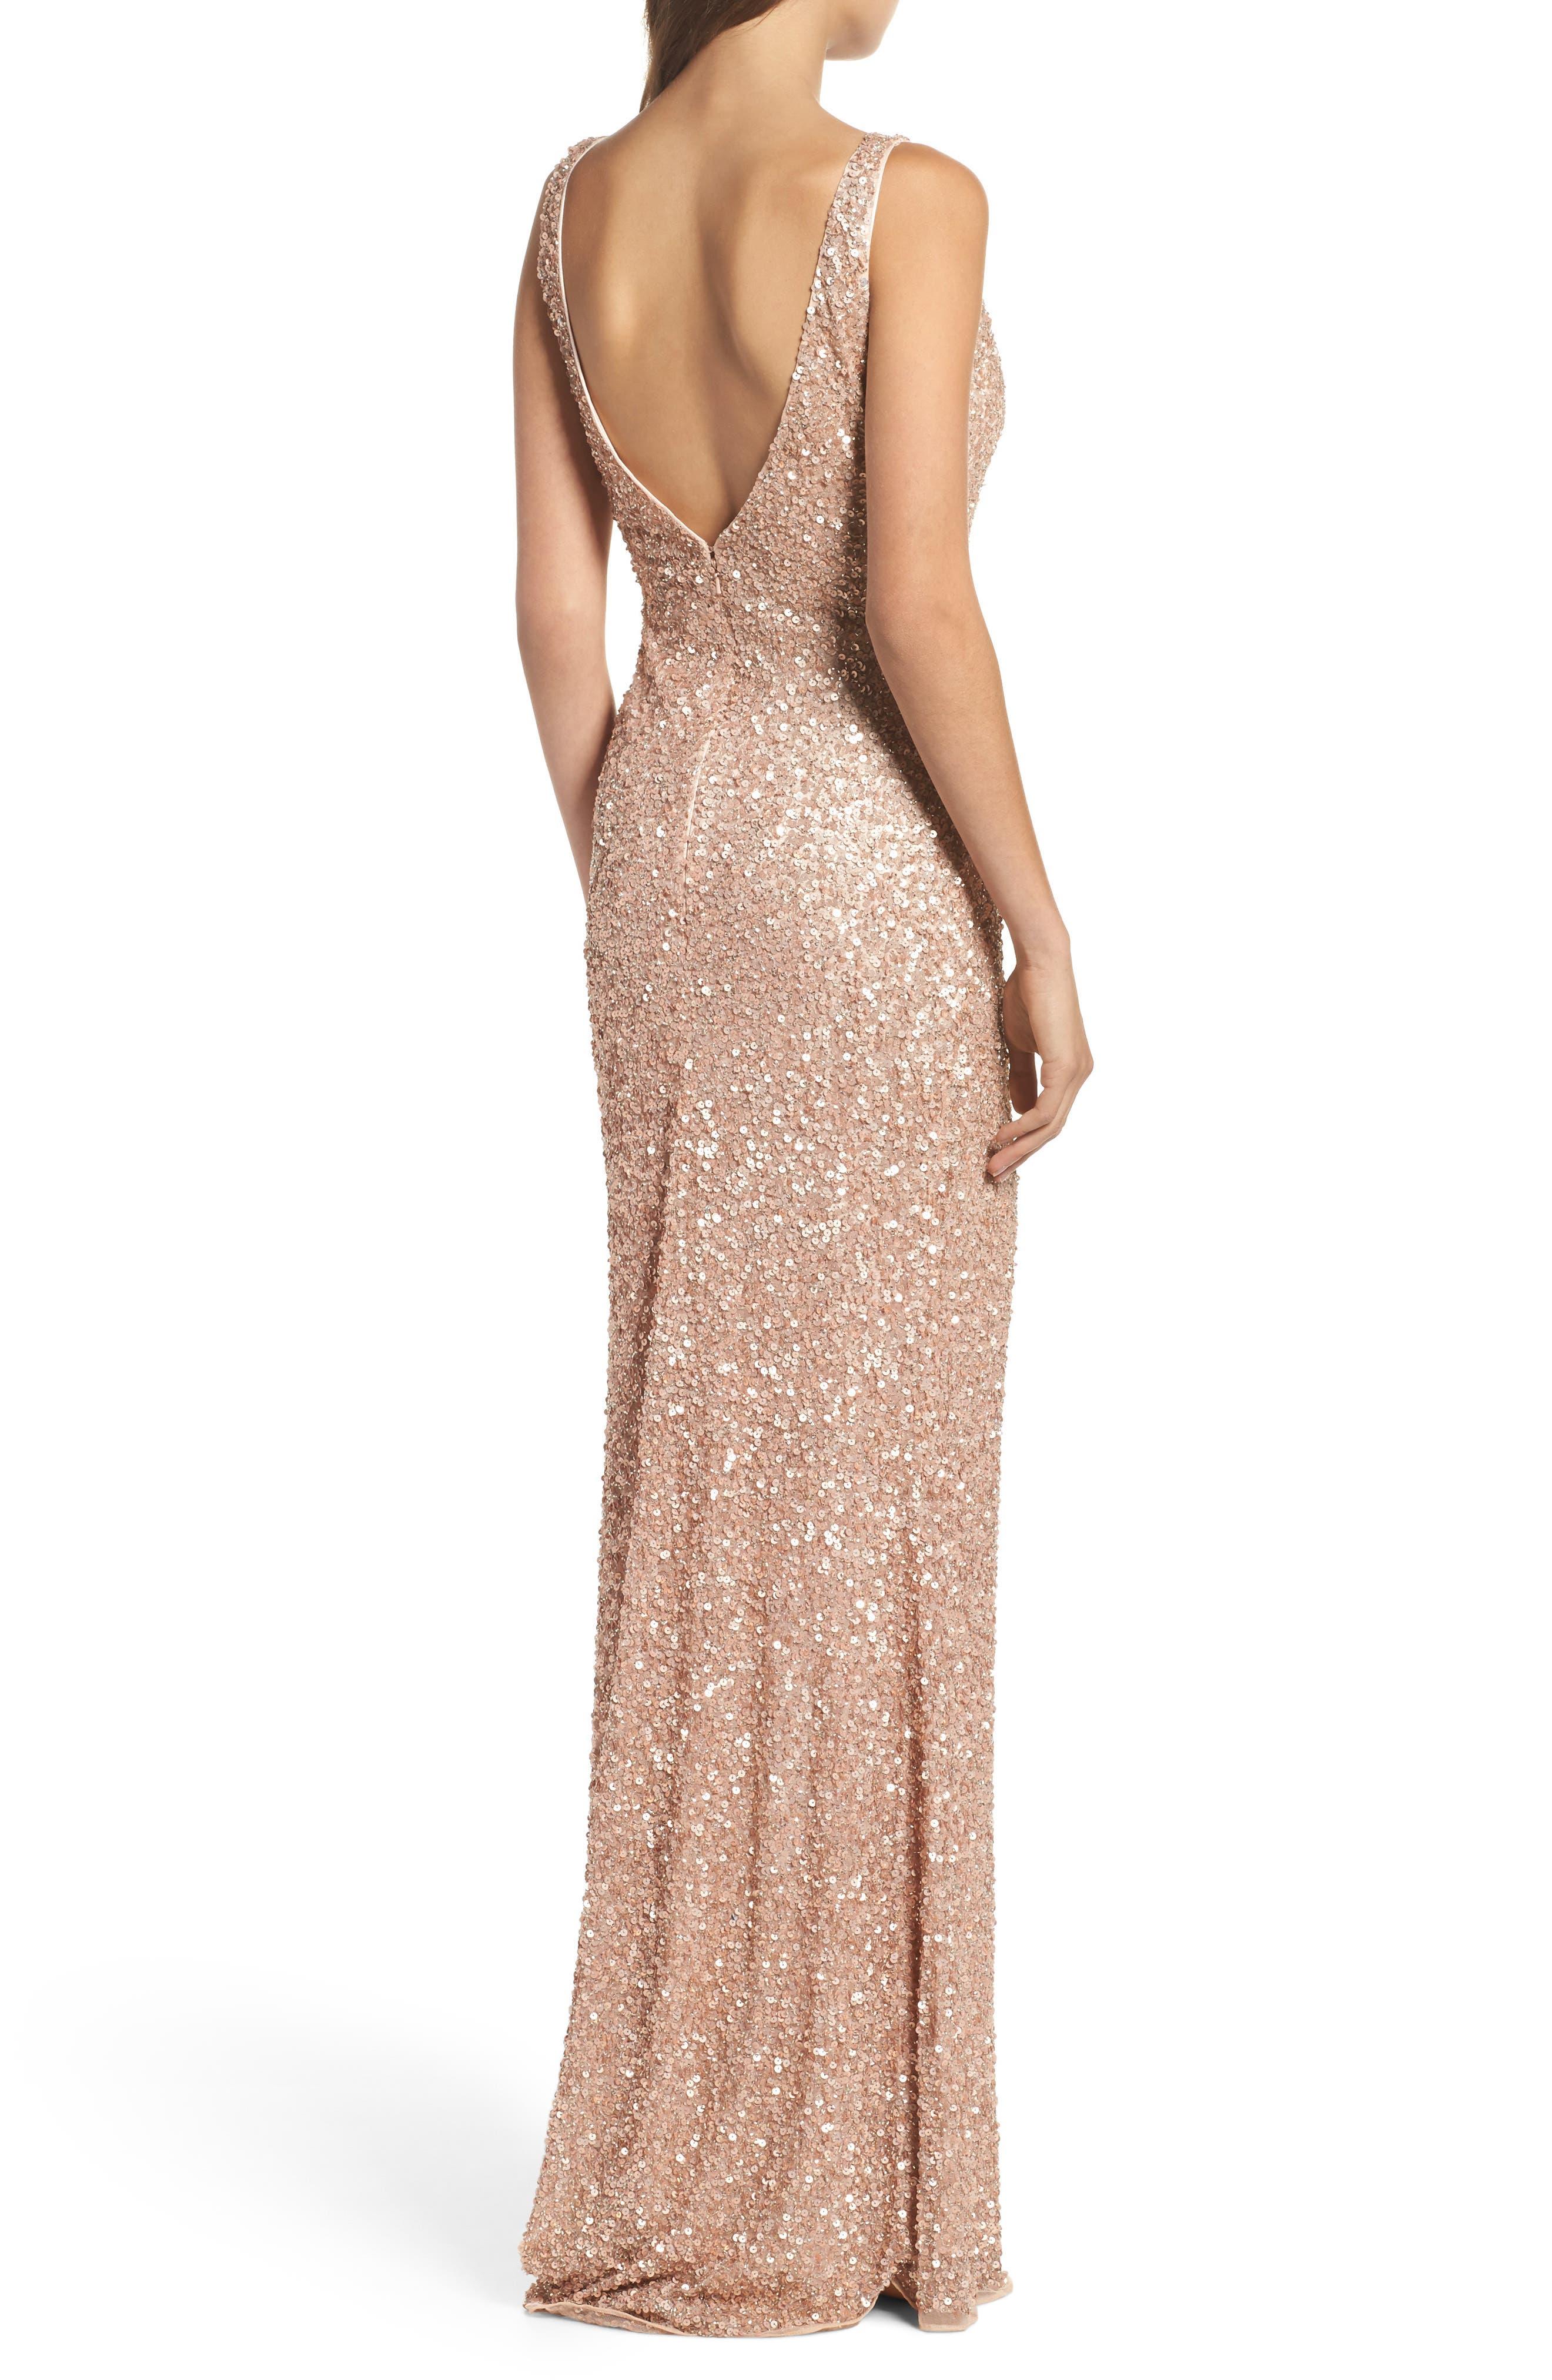 MAC DUGGAL, Sequin Slit Gown, Alternate thumbnail 2, color, ROSE GOLD